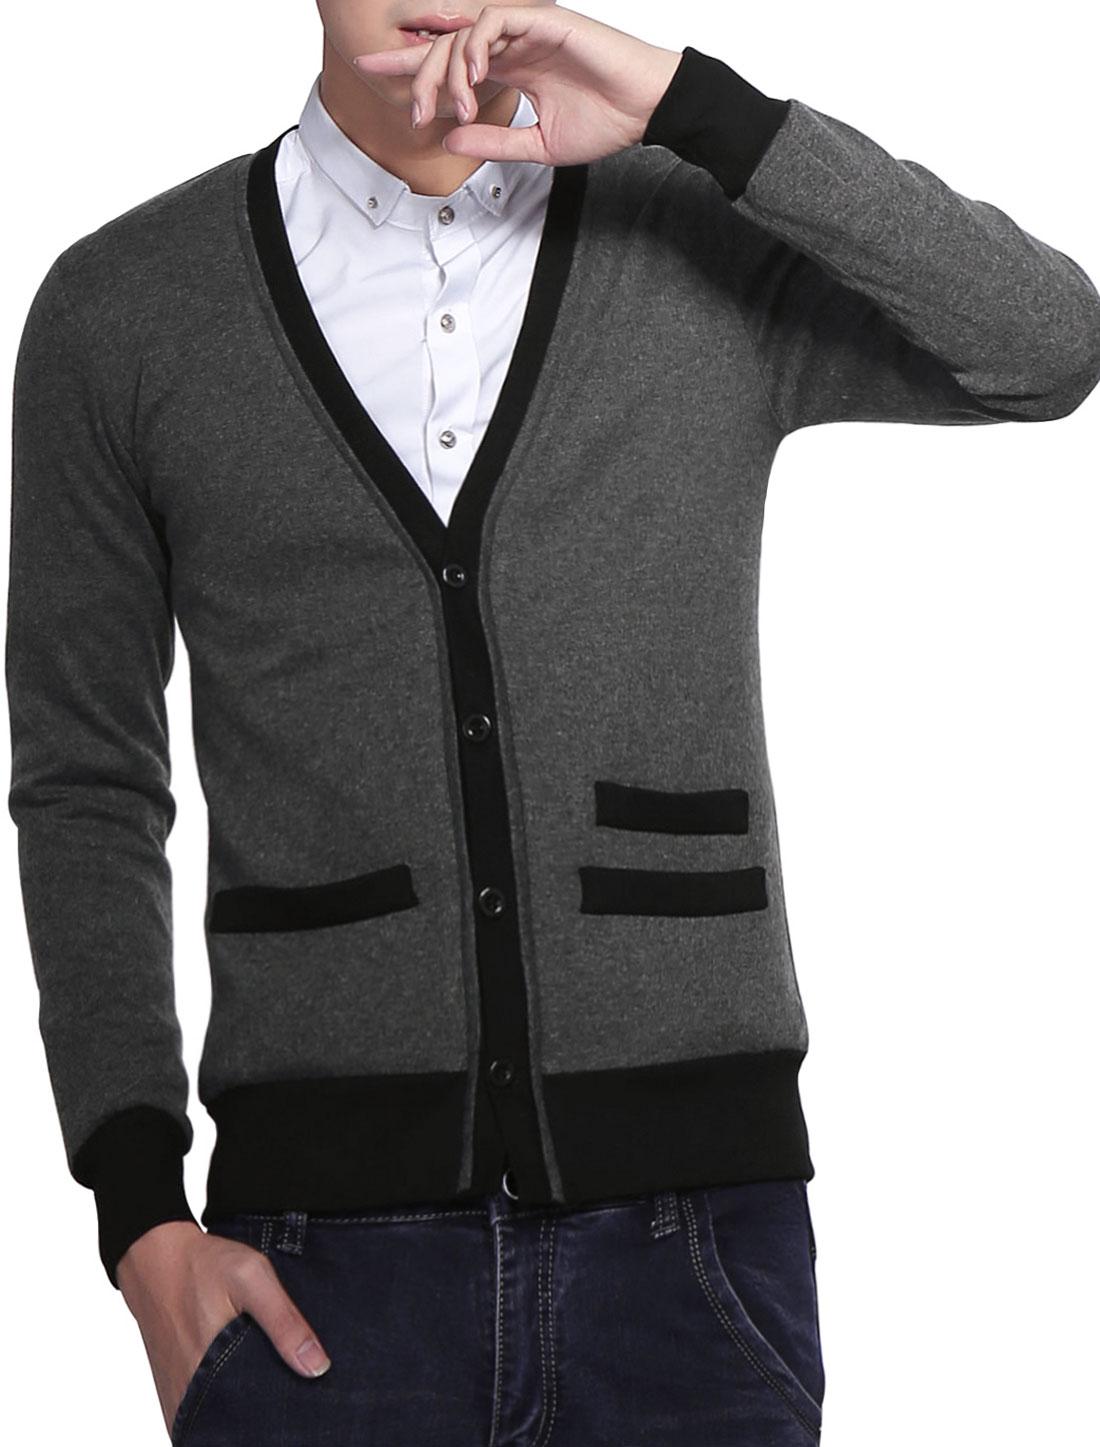 Men Stylish Dark Gray V-neck Ribbing Detail Button Front Cardigan L